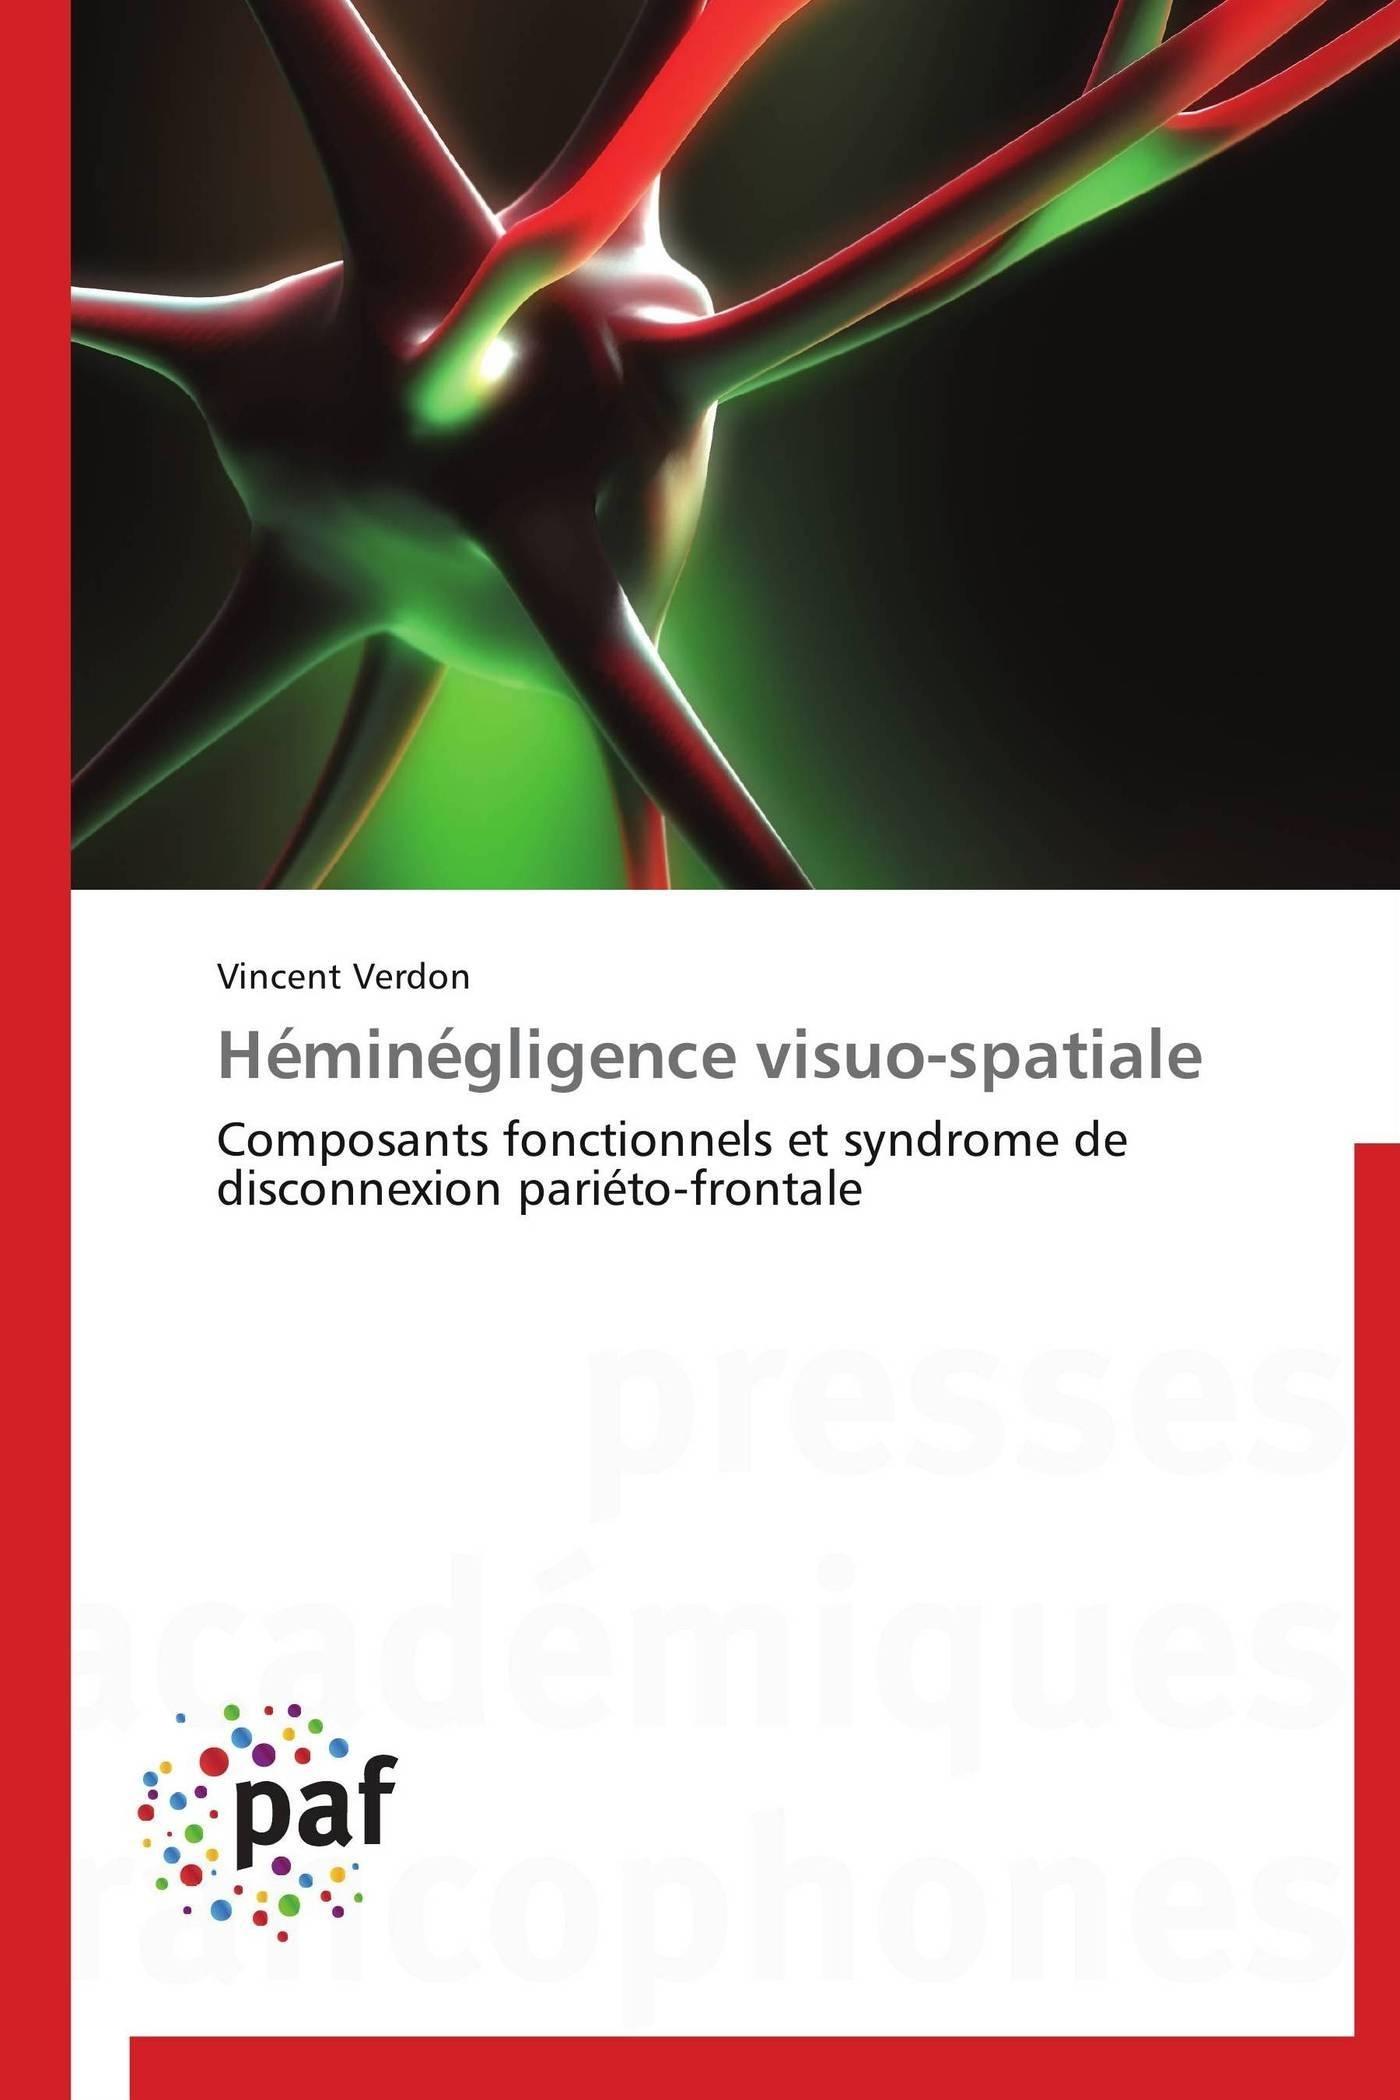 HEMINEGLIGENCE VISUO-SPATIALE